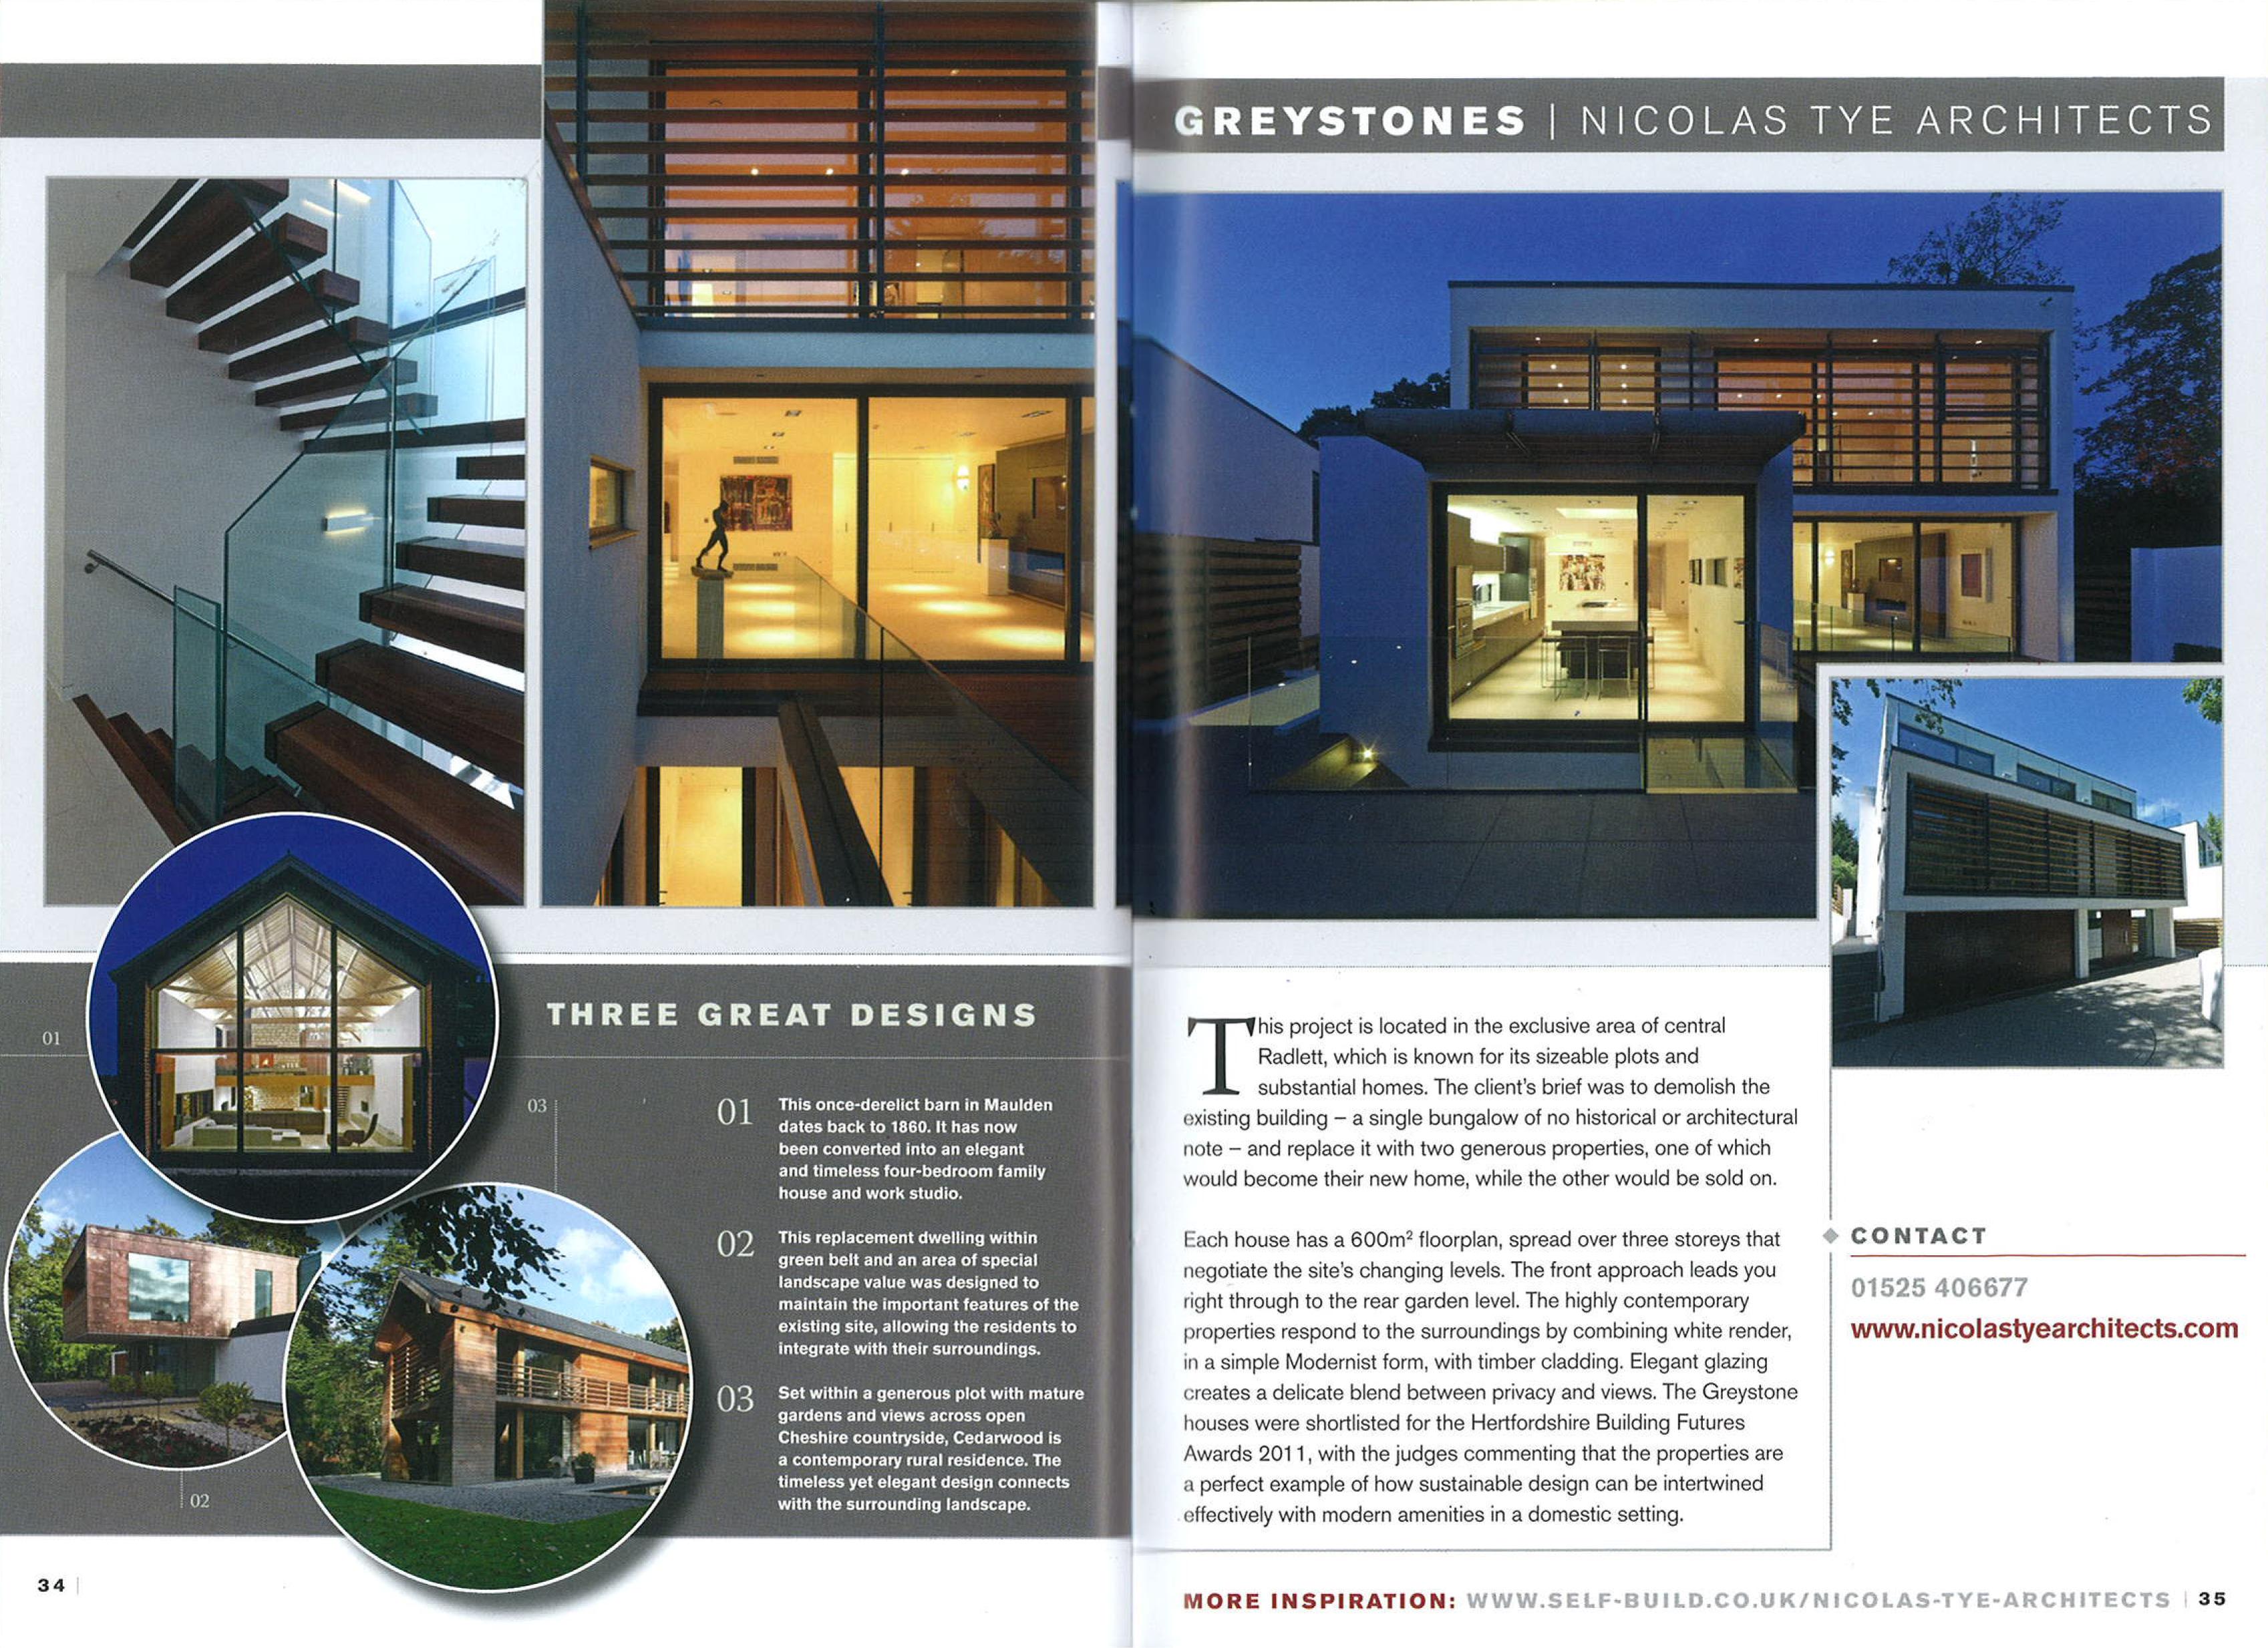 greystones selfbuild design 2015 nicolas tye architects. Black Bedroom Furniture Sets. Home Design Ideas